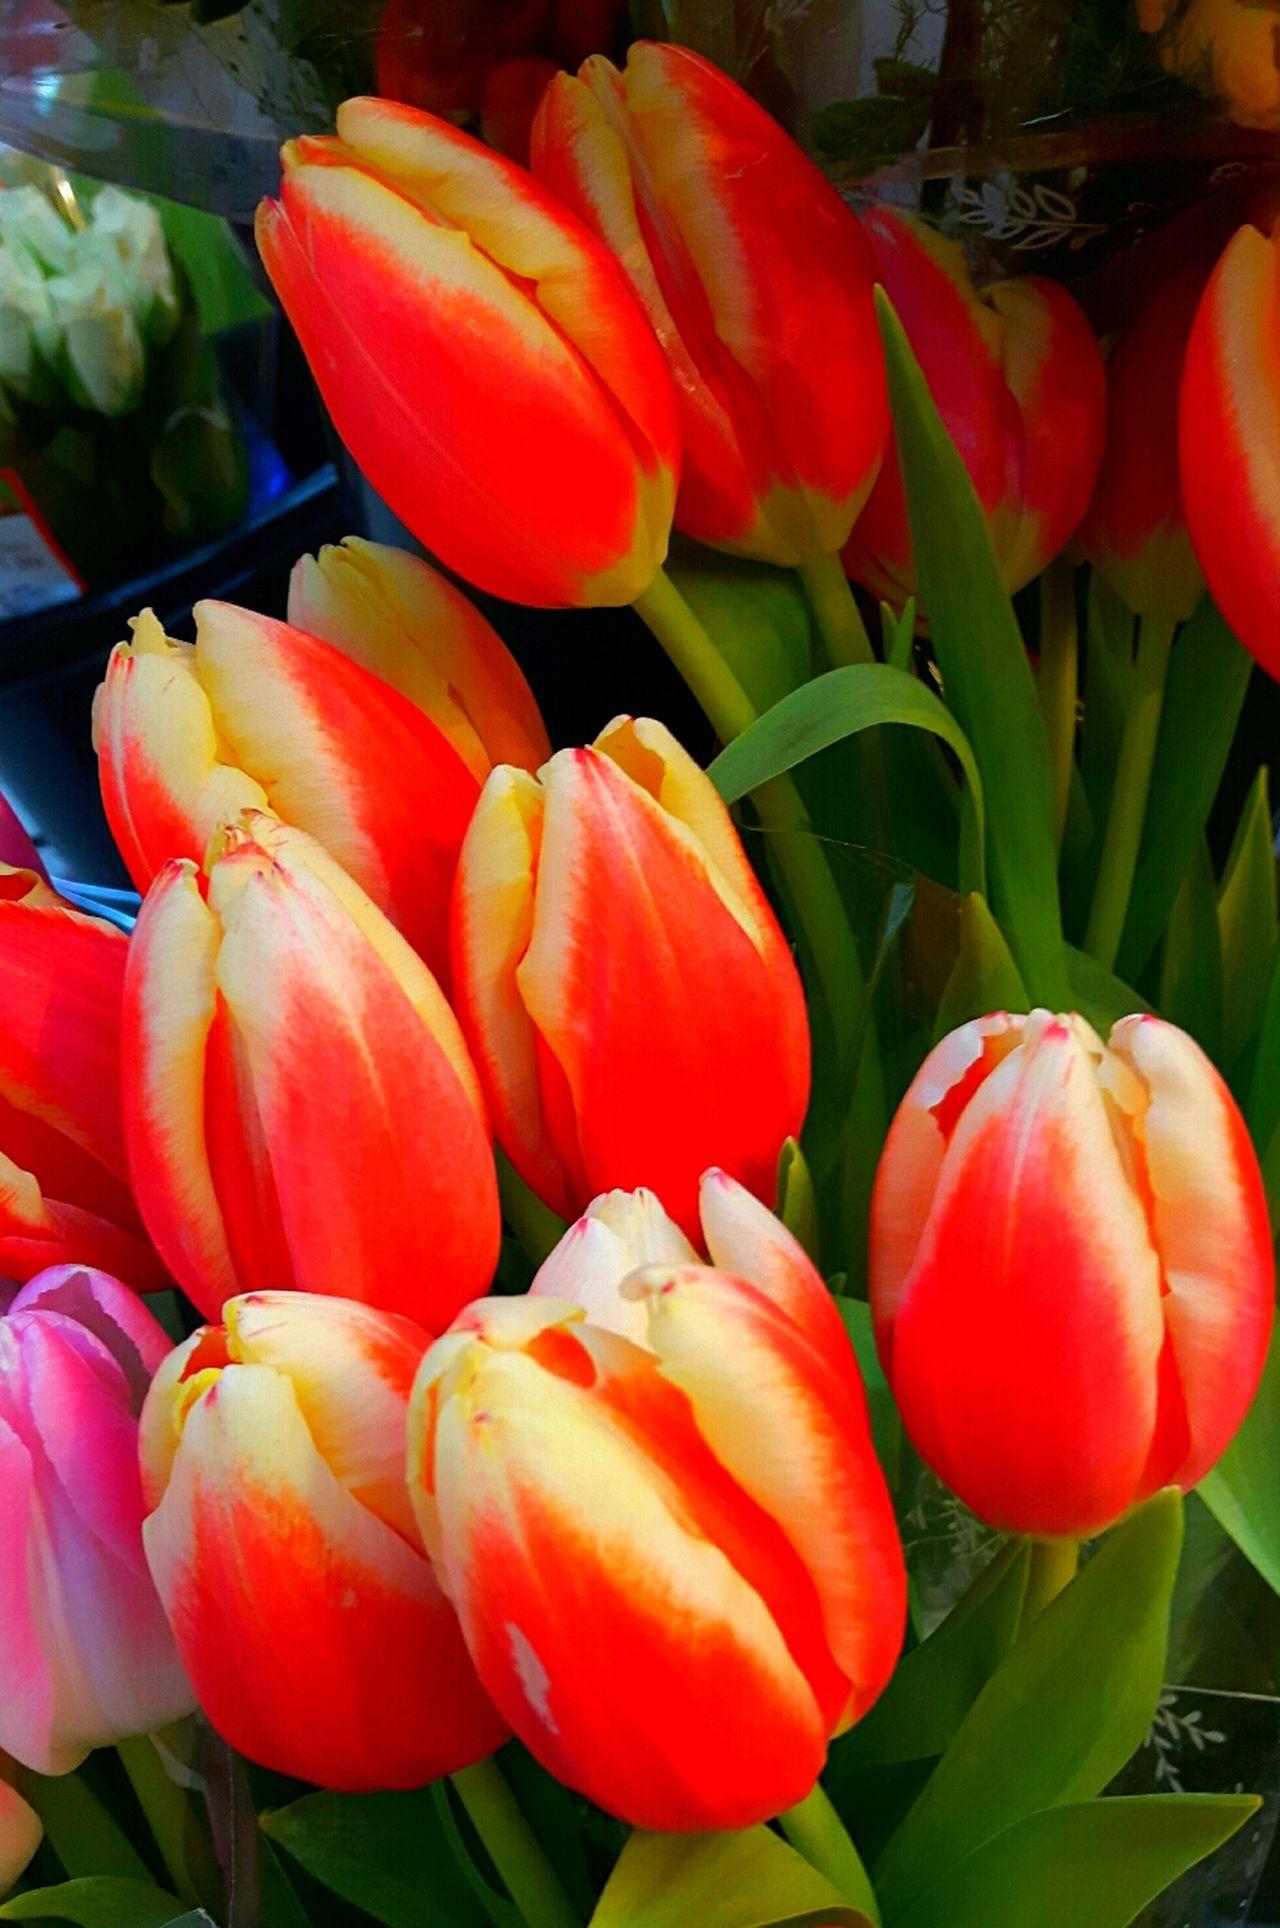 Tulpen Red Market Day Beauty In Nature Flower Head Blumenstrauß Plants And Flowers Flowers_collection Flower Photography Flower_Collection Blumenpracht🌺🍃 Flower Collection Tulpe Photography Flower Plant Flowers,Plants & Garden Beliebte Fotos